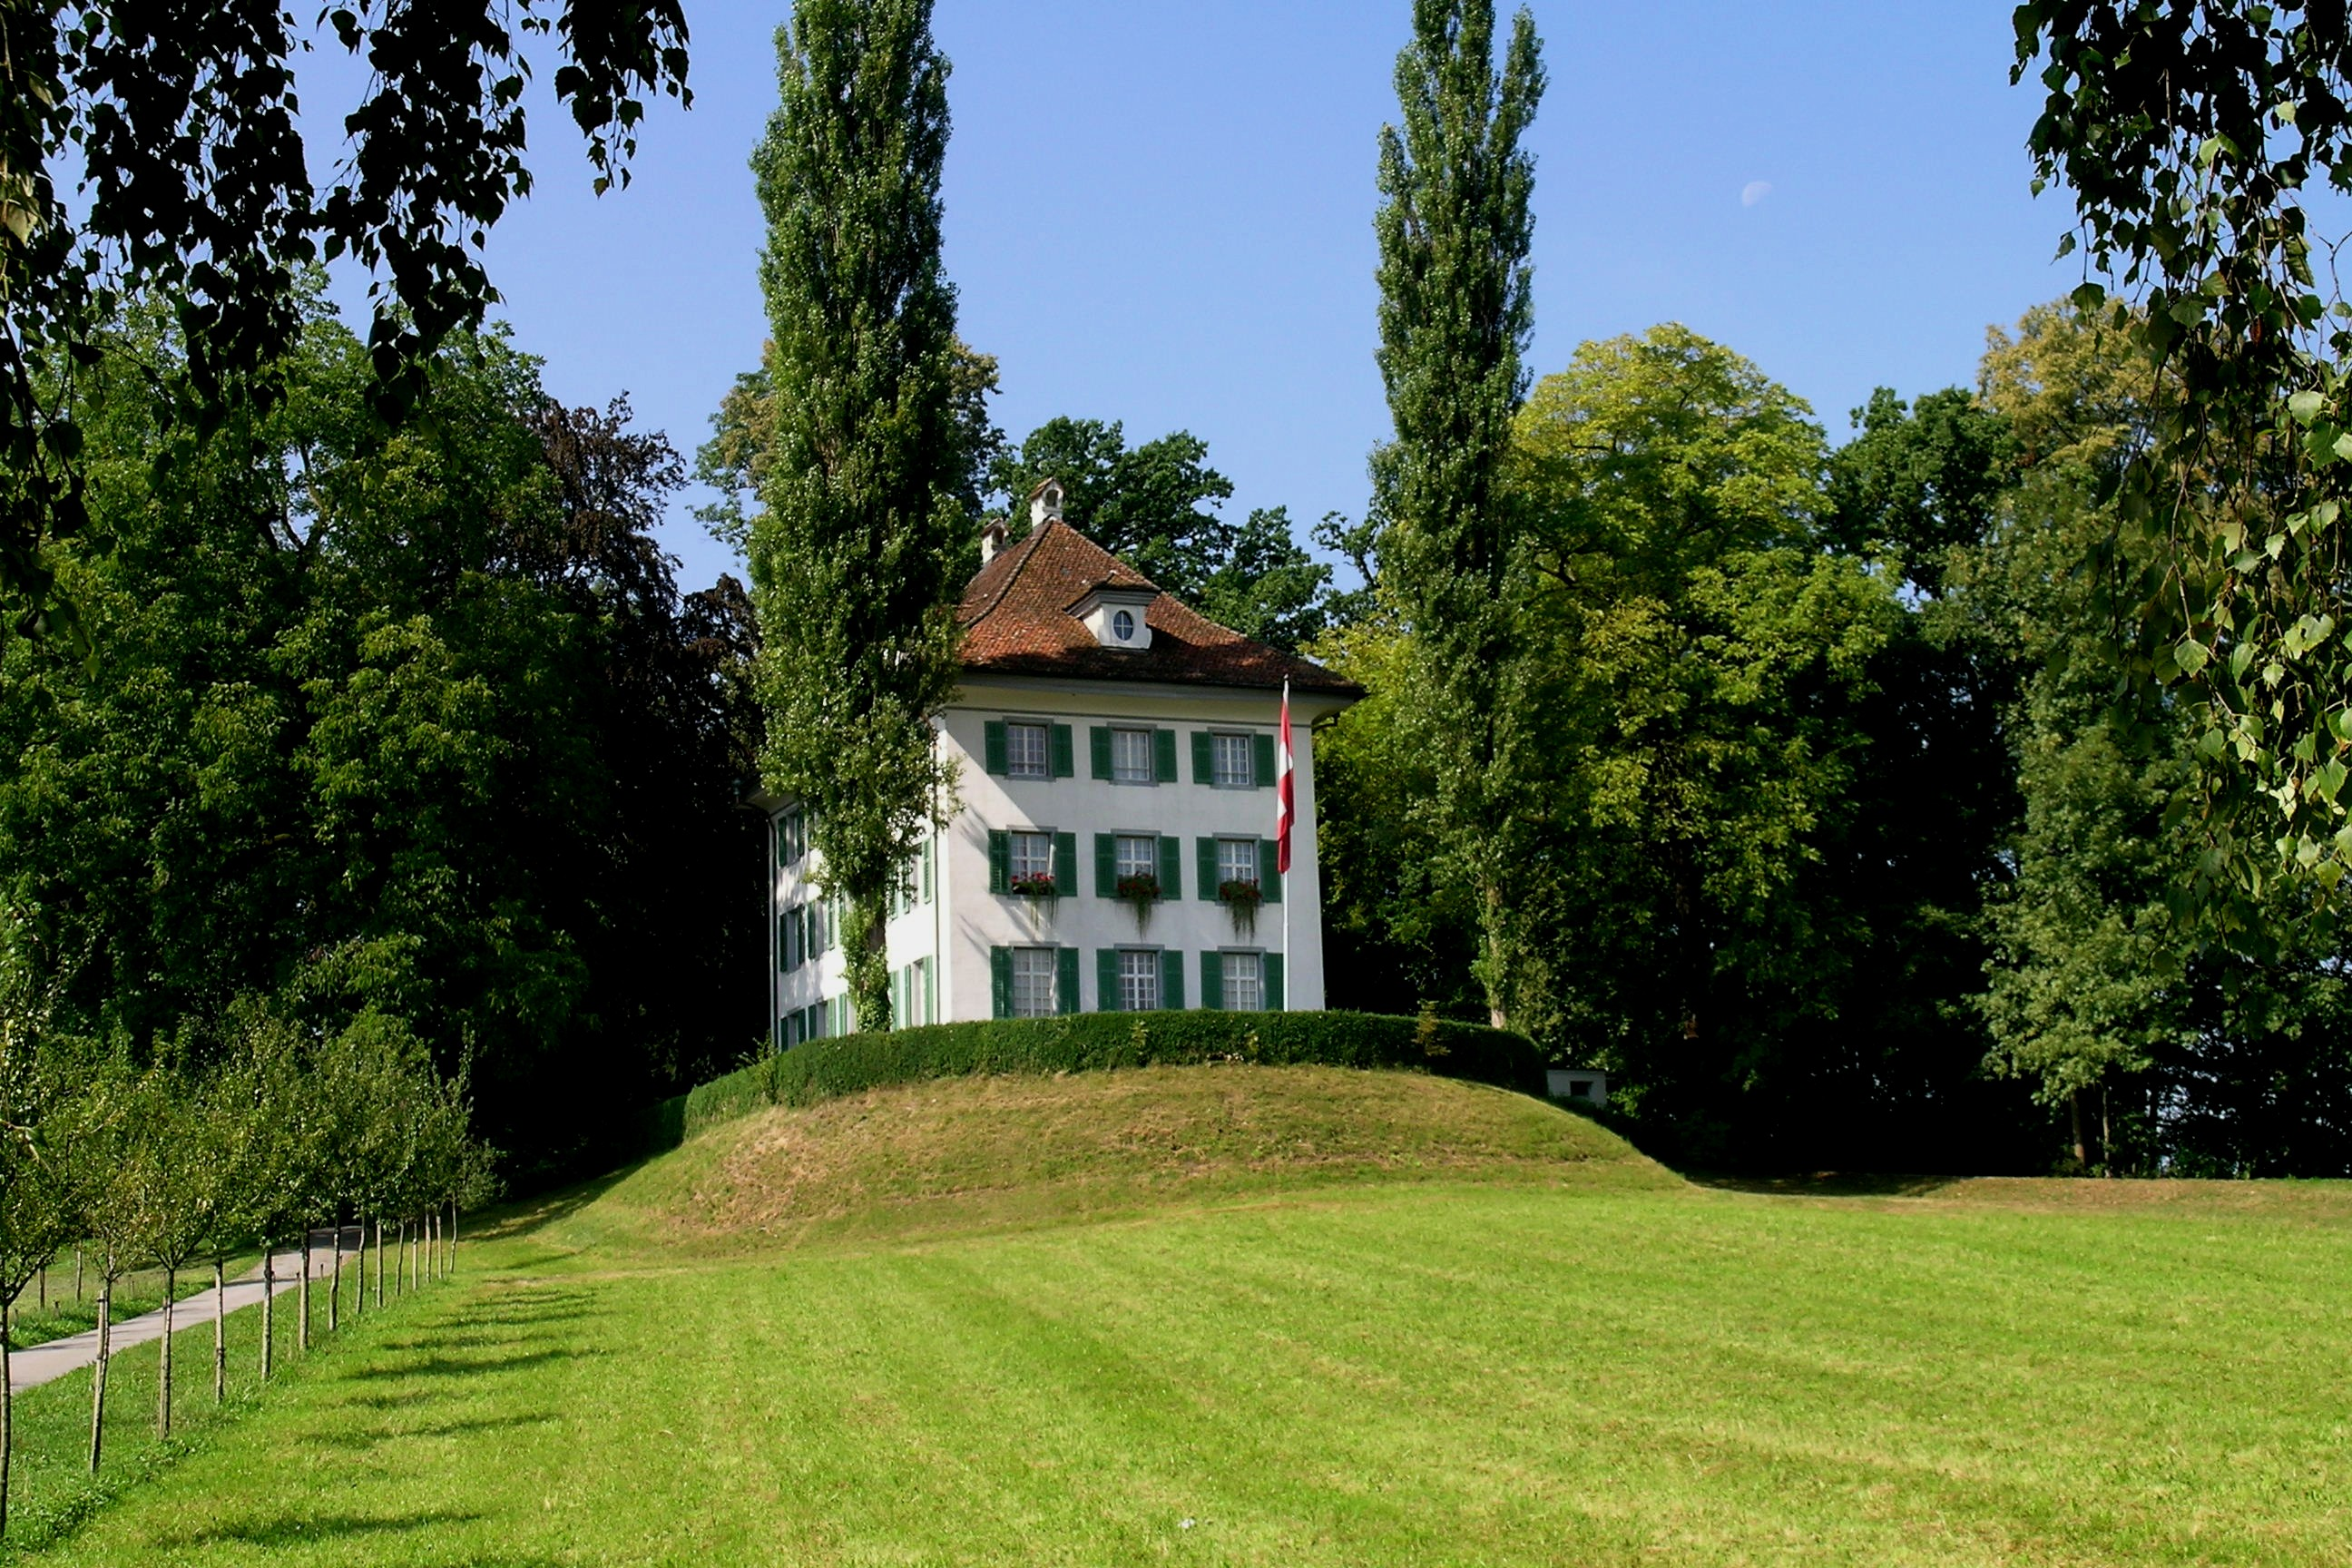 Wagner Museum Luzern